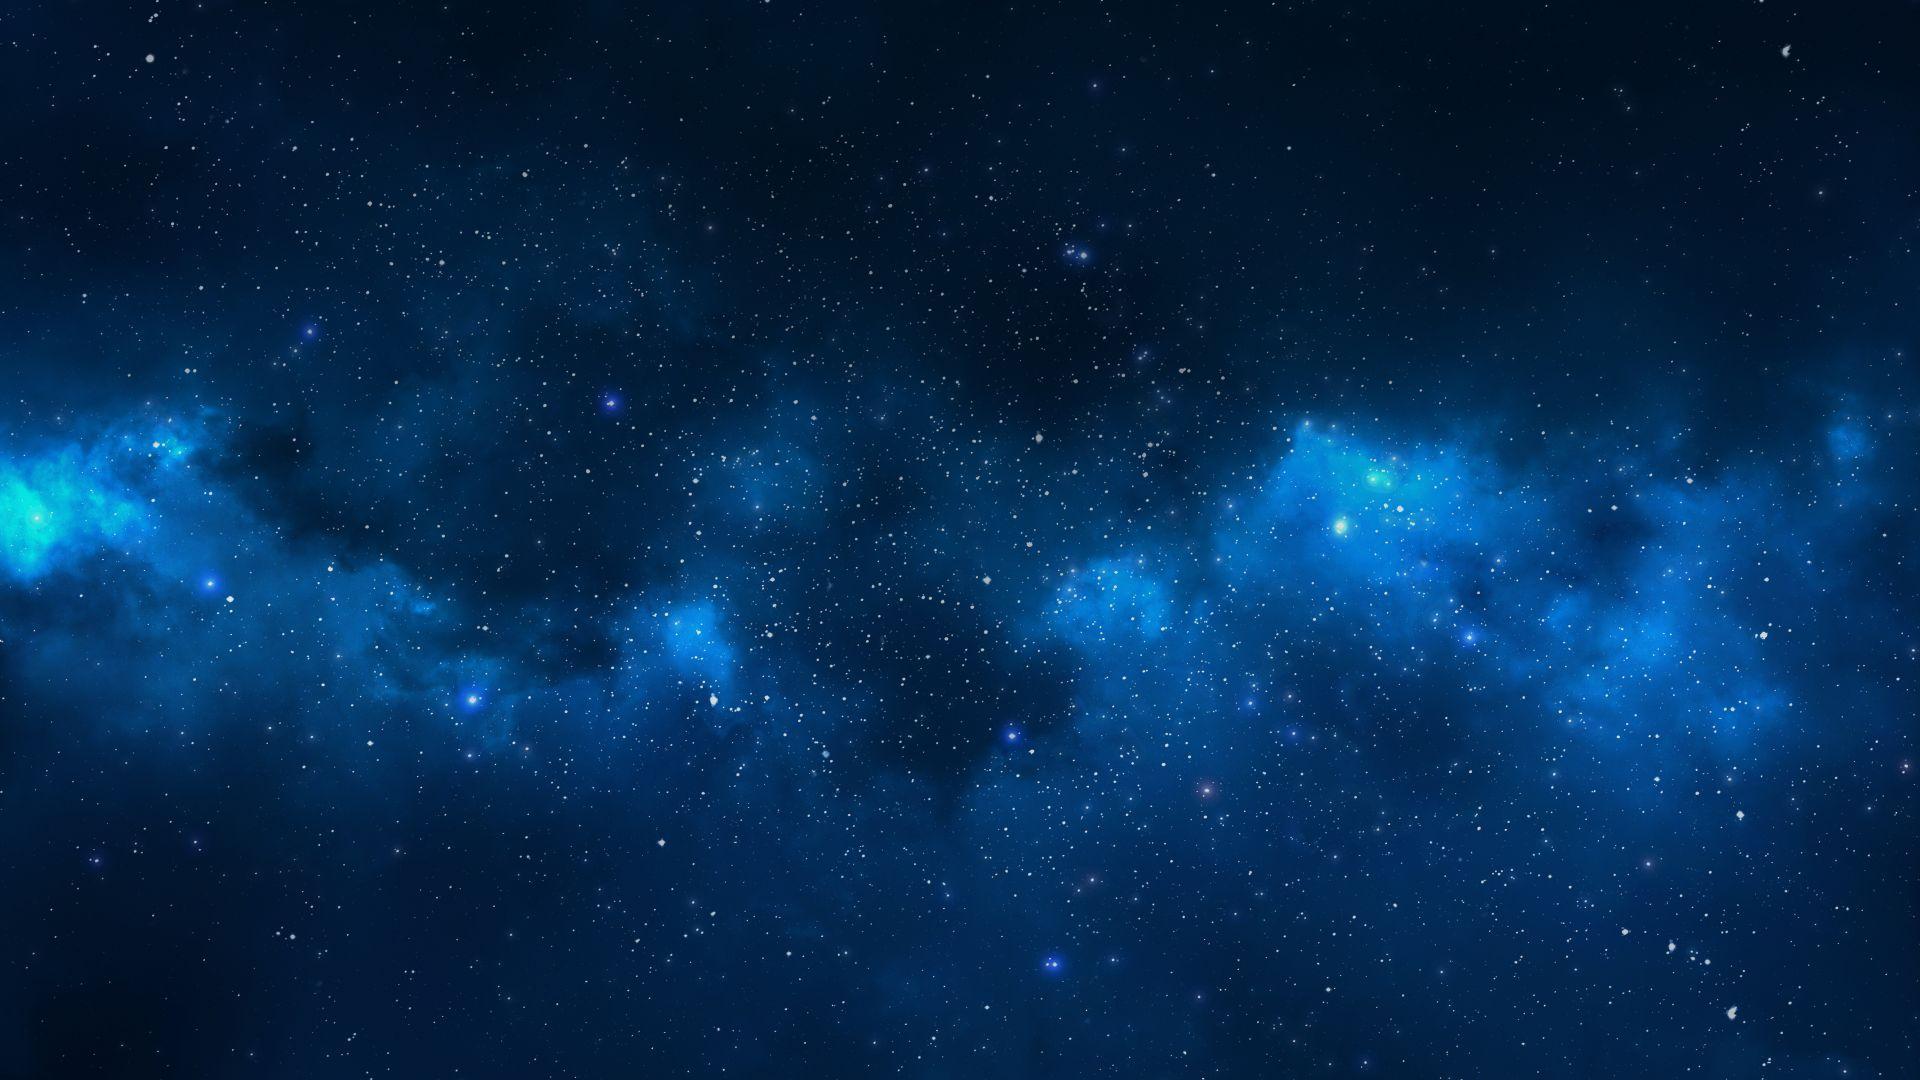 Wallpaper Nebula Space Stars 4k Space 6592 Nebula Wallpaper Night Sky Hd Night Sky Wallpaper Wallpaper milky way starry night nebula